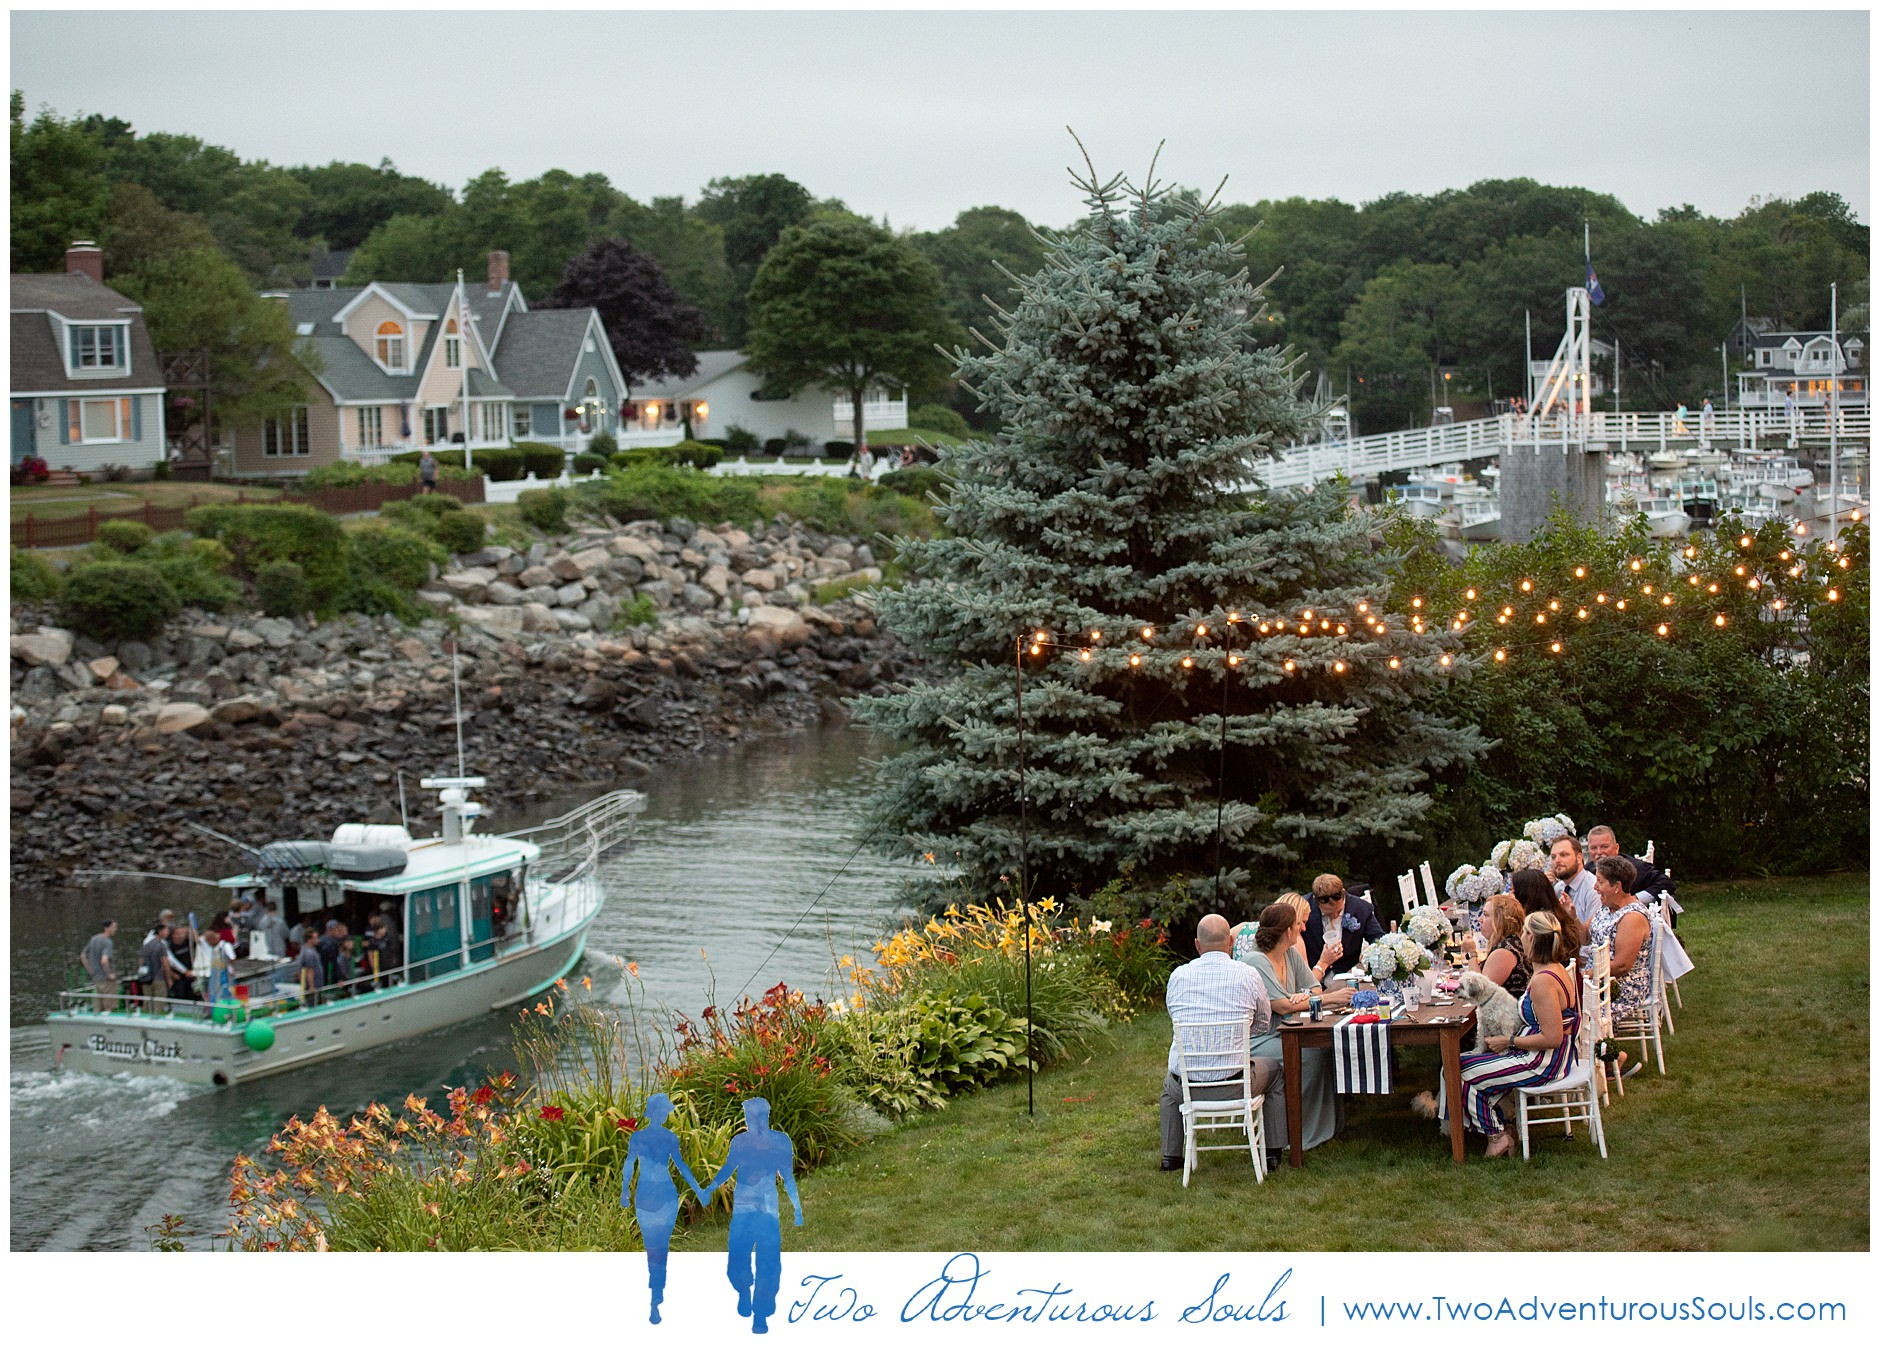 Maine Wedding Photographers, Ogunquit Wedding Photographers, Maine Elopement Photographers, Two Adventurous Souls-080619_0038.jpg